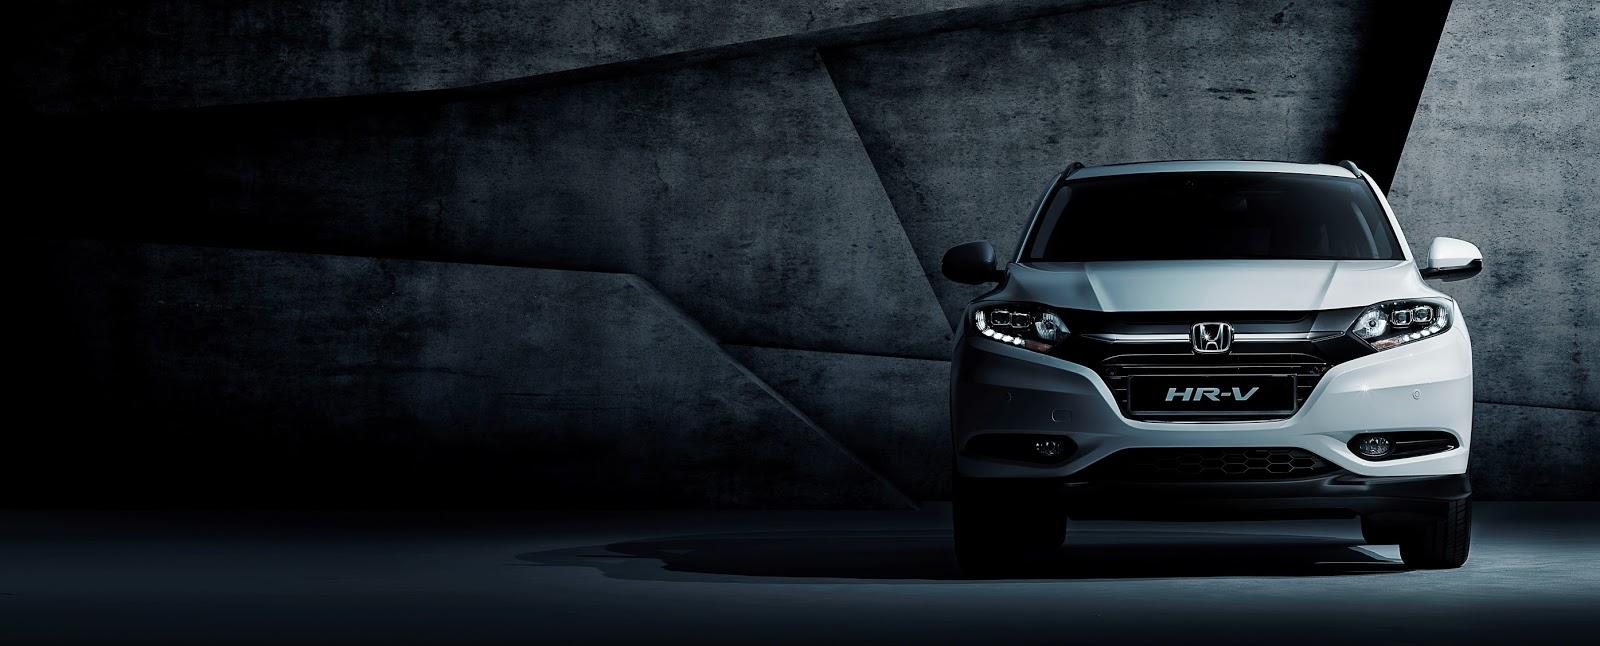 54596 All new HR V Όλες οι λεπτομέρειες για το νέο Honda HR-V Honda, Honda HR-V, HR-V, SUV